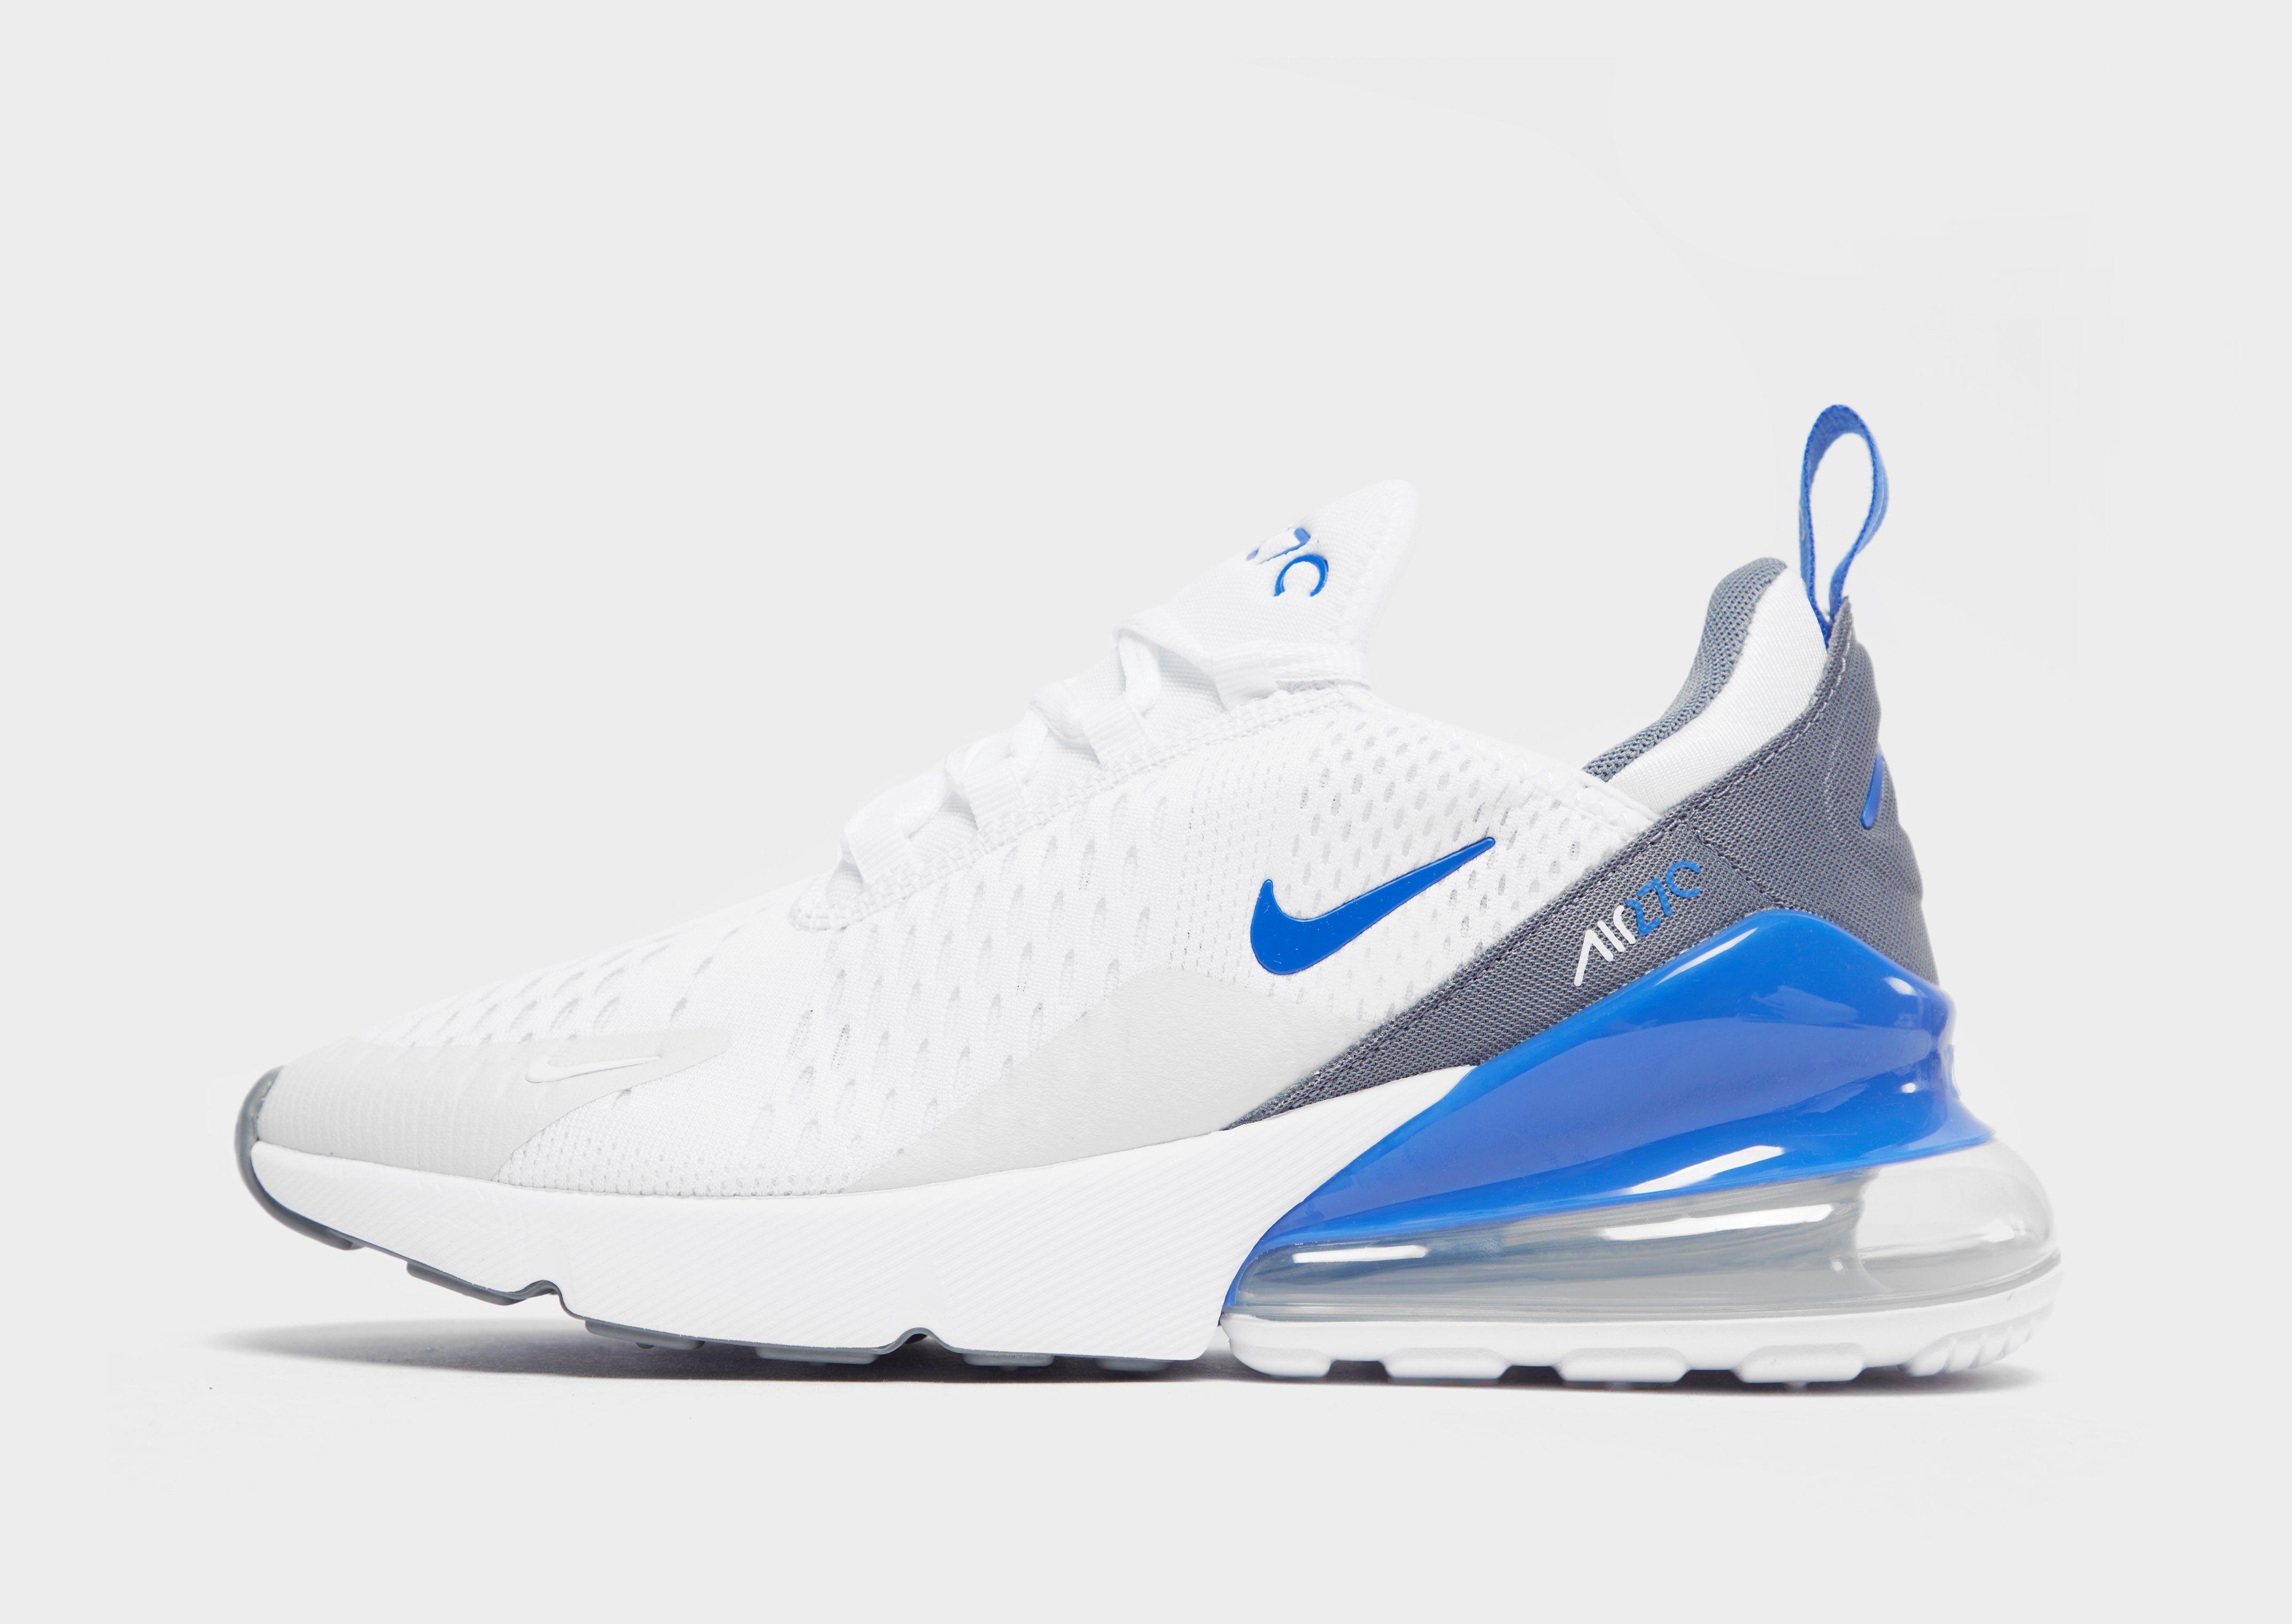 online retailer e2431 d9e28 Nike Air Max 270 Older Kids' Shoe   JD Sports